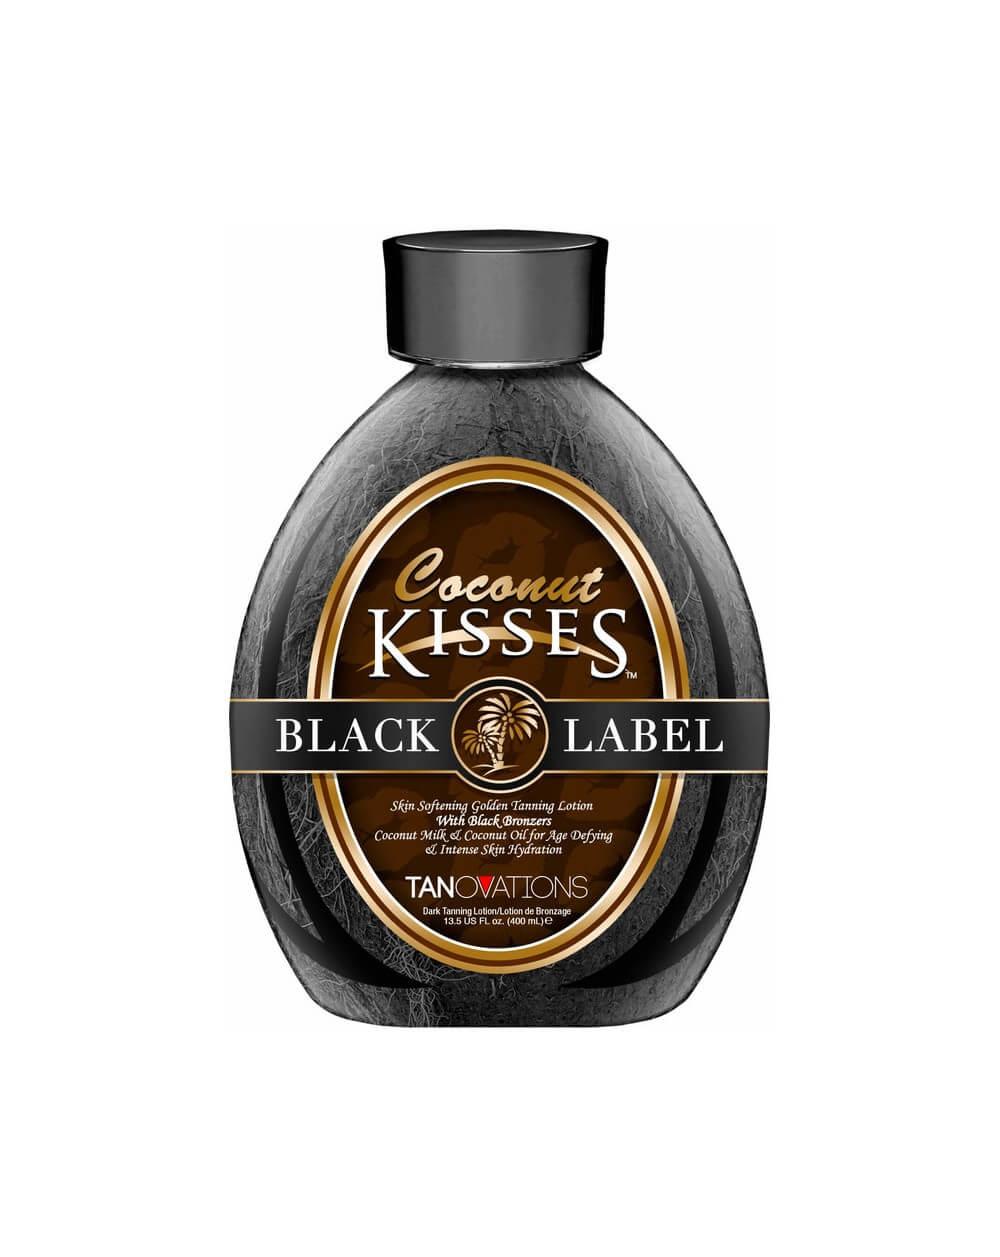 Coconut Kisses Black Label ™-Soliariumo kremai-Exclusive